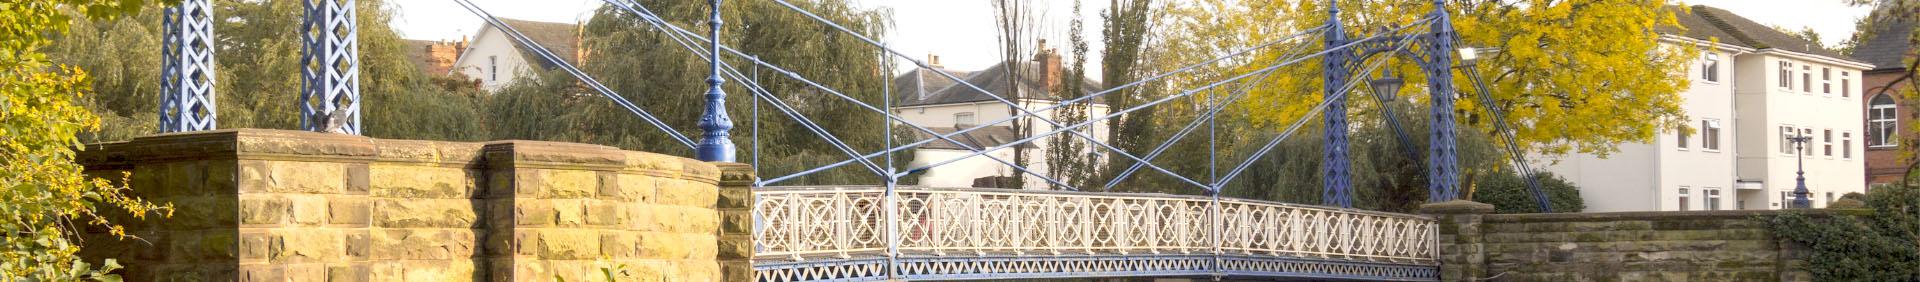 georgian houses near royal leamington spa 1920x282